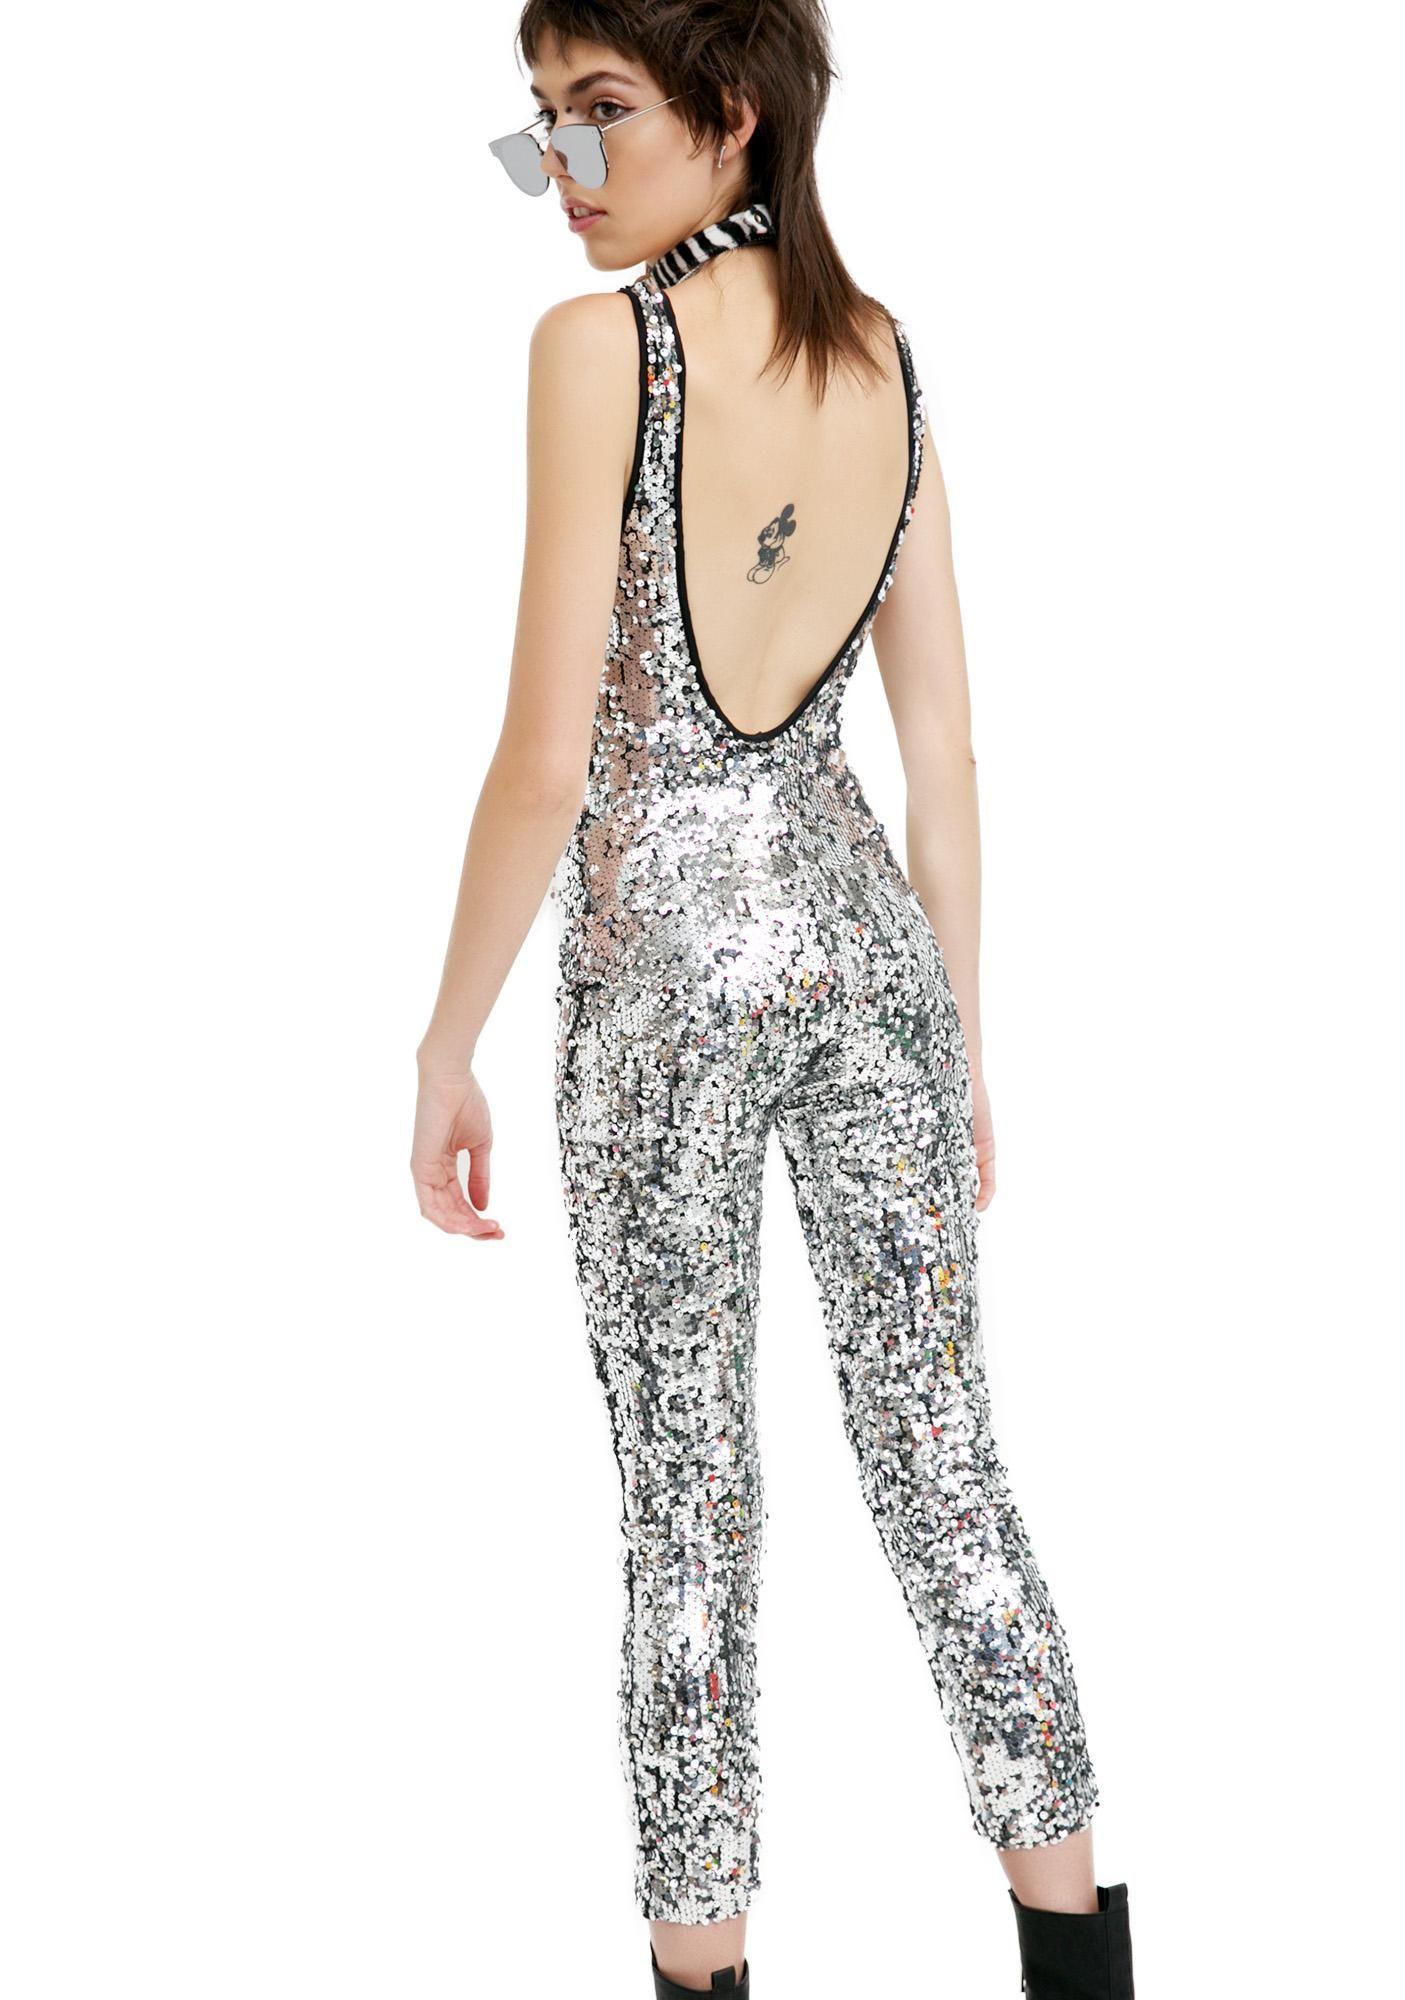 029ecab8822 Silver Glitter Jumpsuit